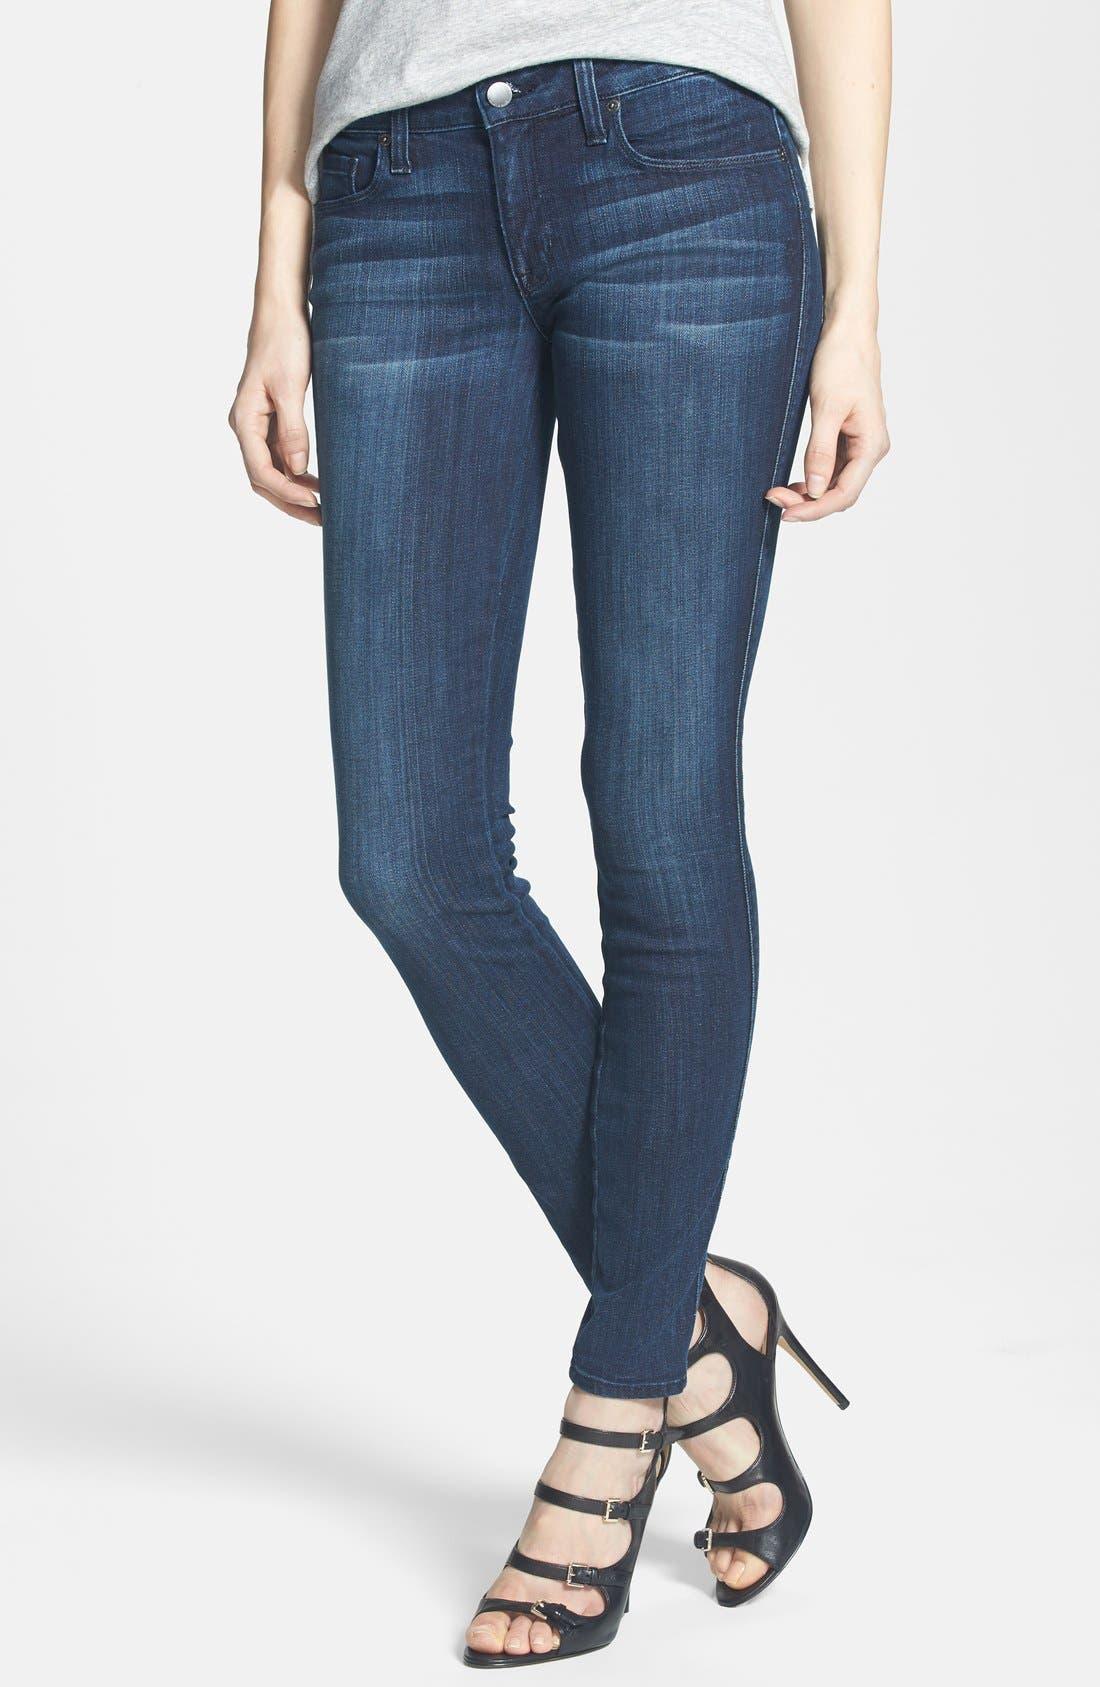 Main Image - Genetic 'Shya' Skinny Jeans (Hype)